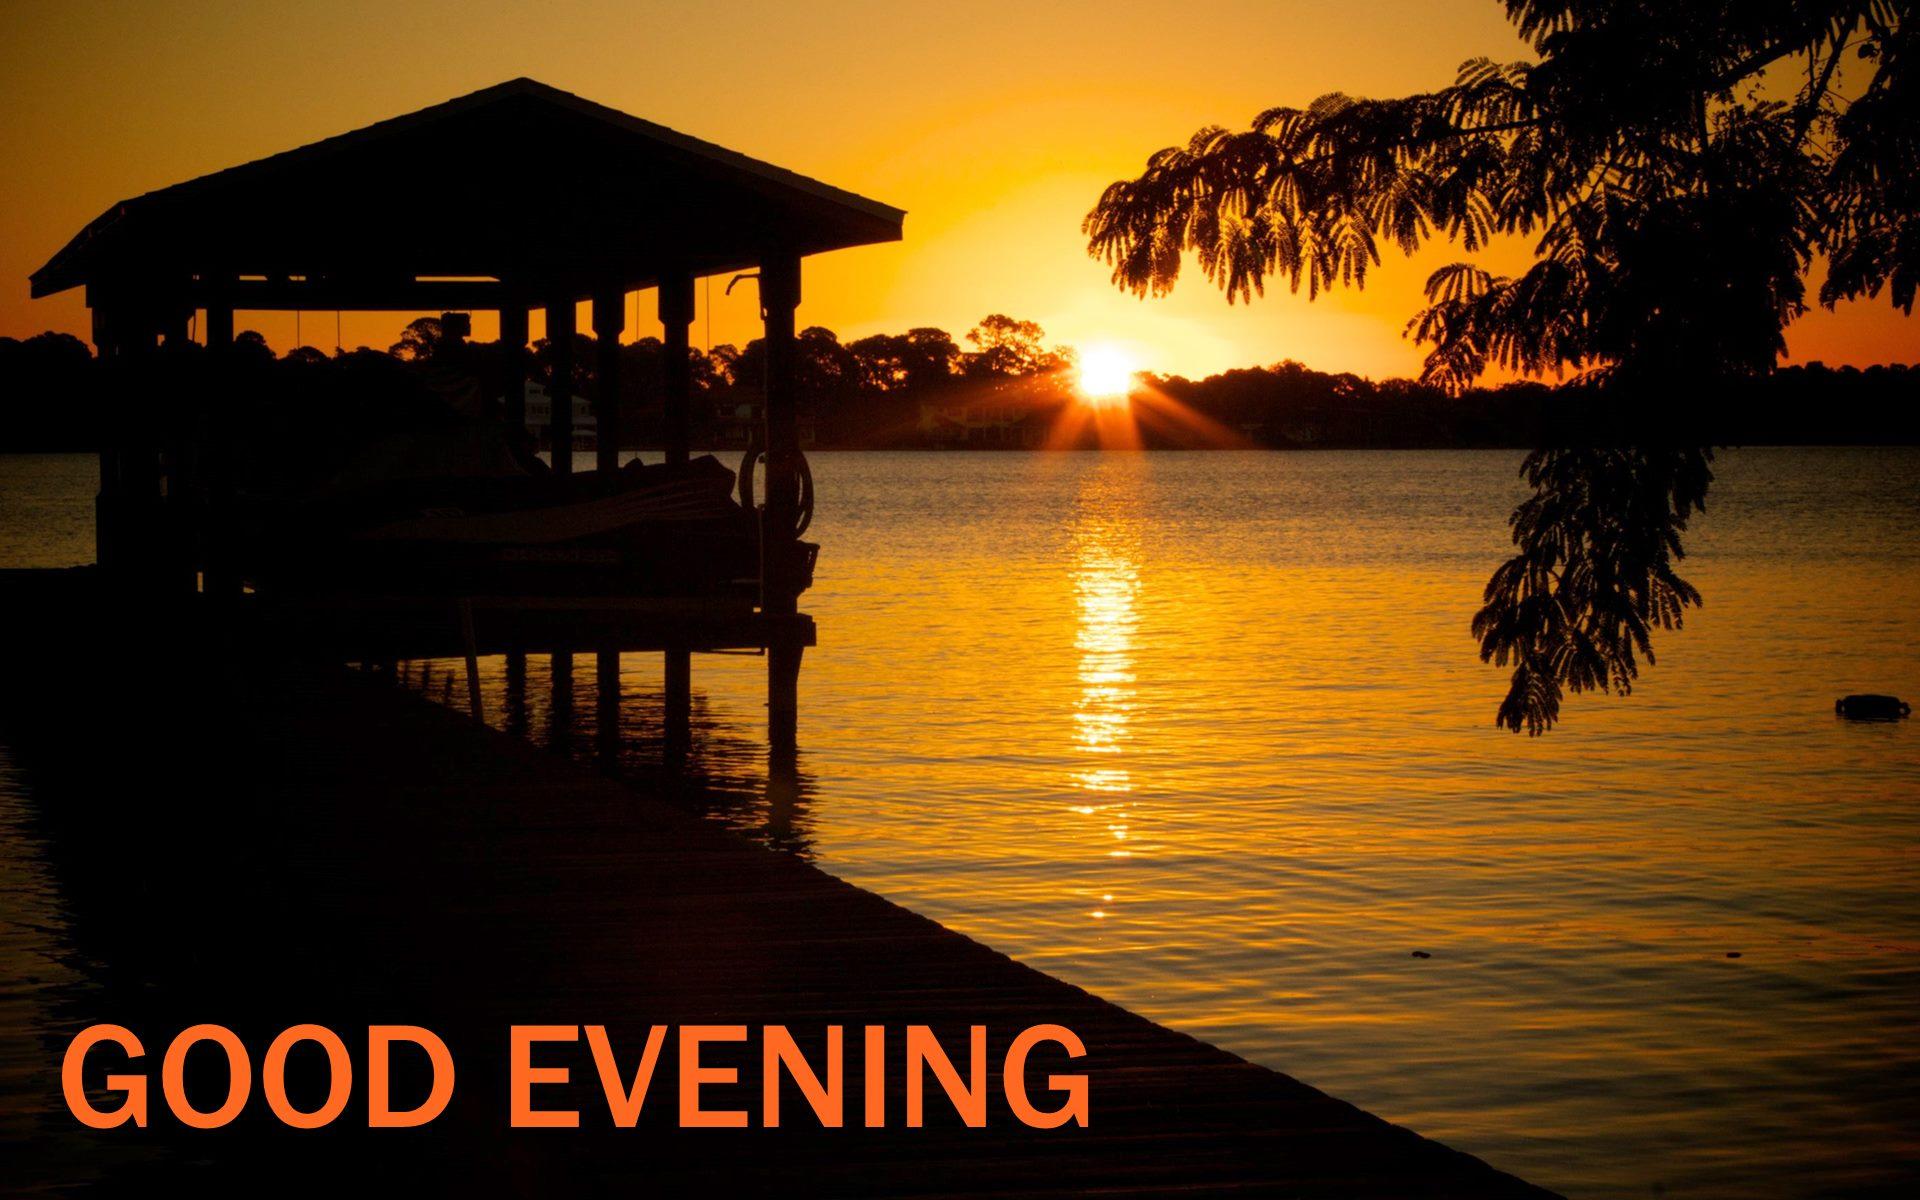 Amazing Sunset Good Evening Hd Wallpaper 02230 My Blog